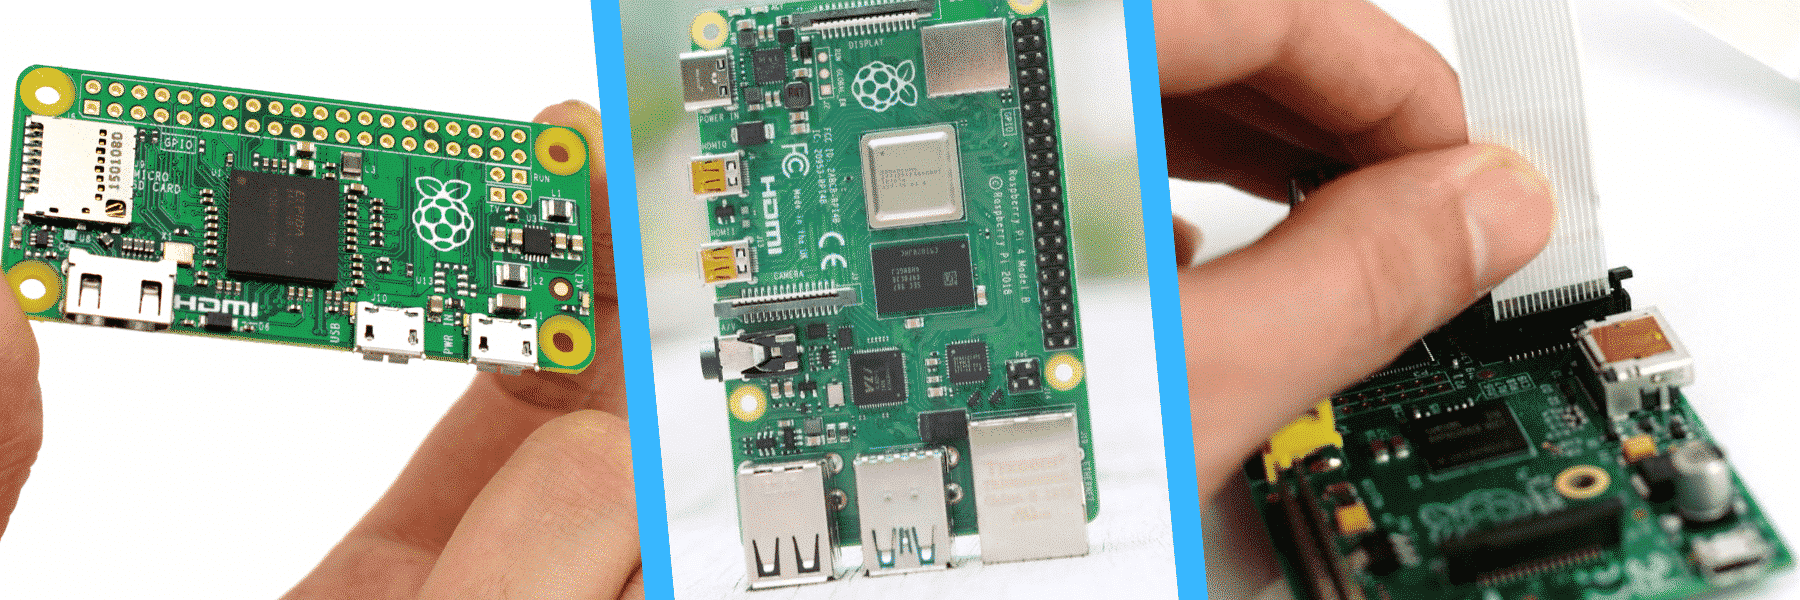 Welke Raspberry Pi heb ik?